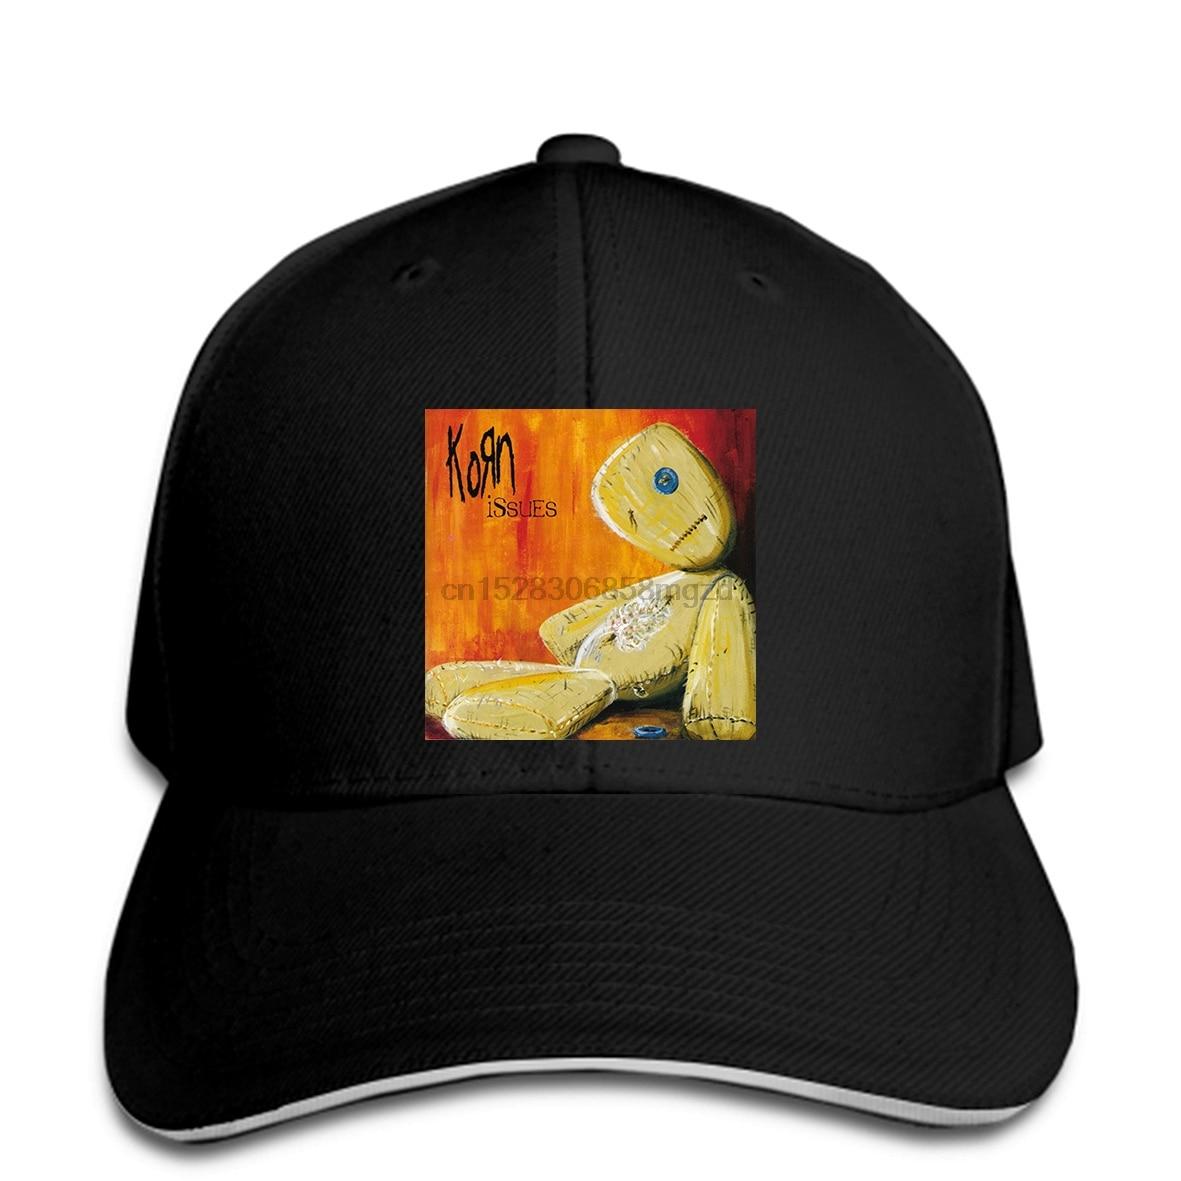 KORN Issues alternativa Metal Rock Band hombres negros gorra de béisbol gorra Snapback mujeres sombrero pico